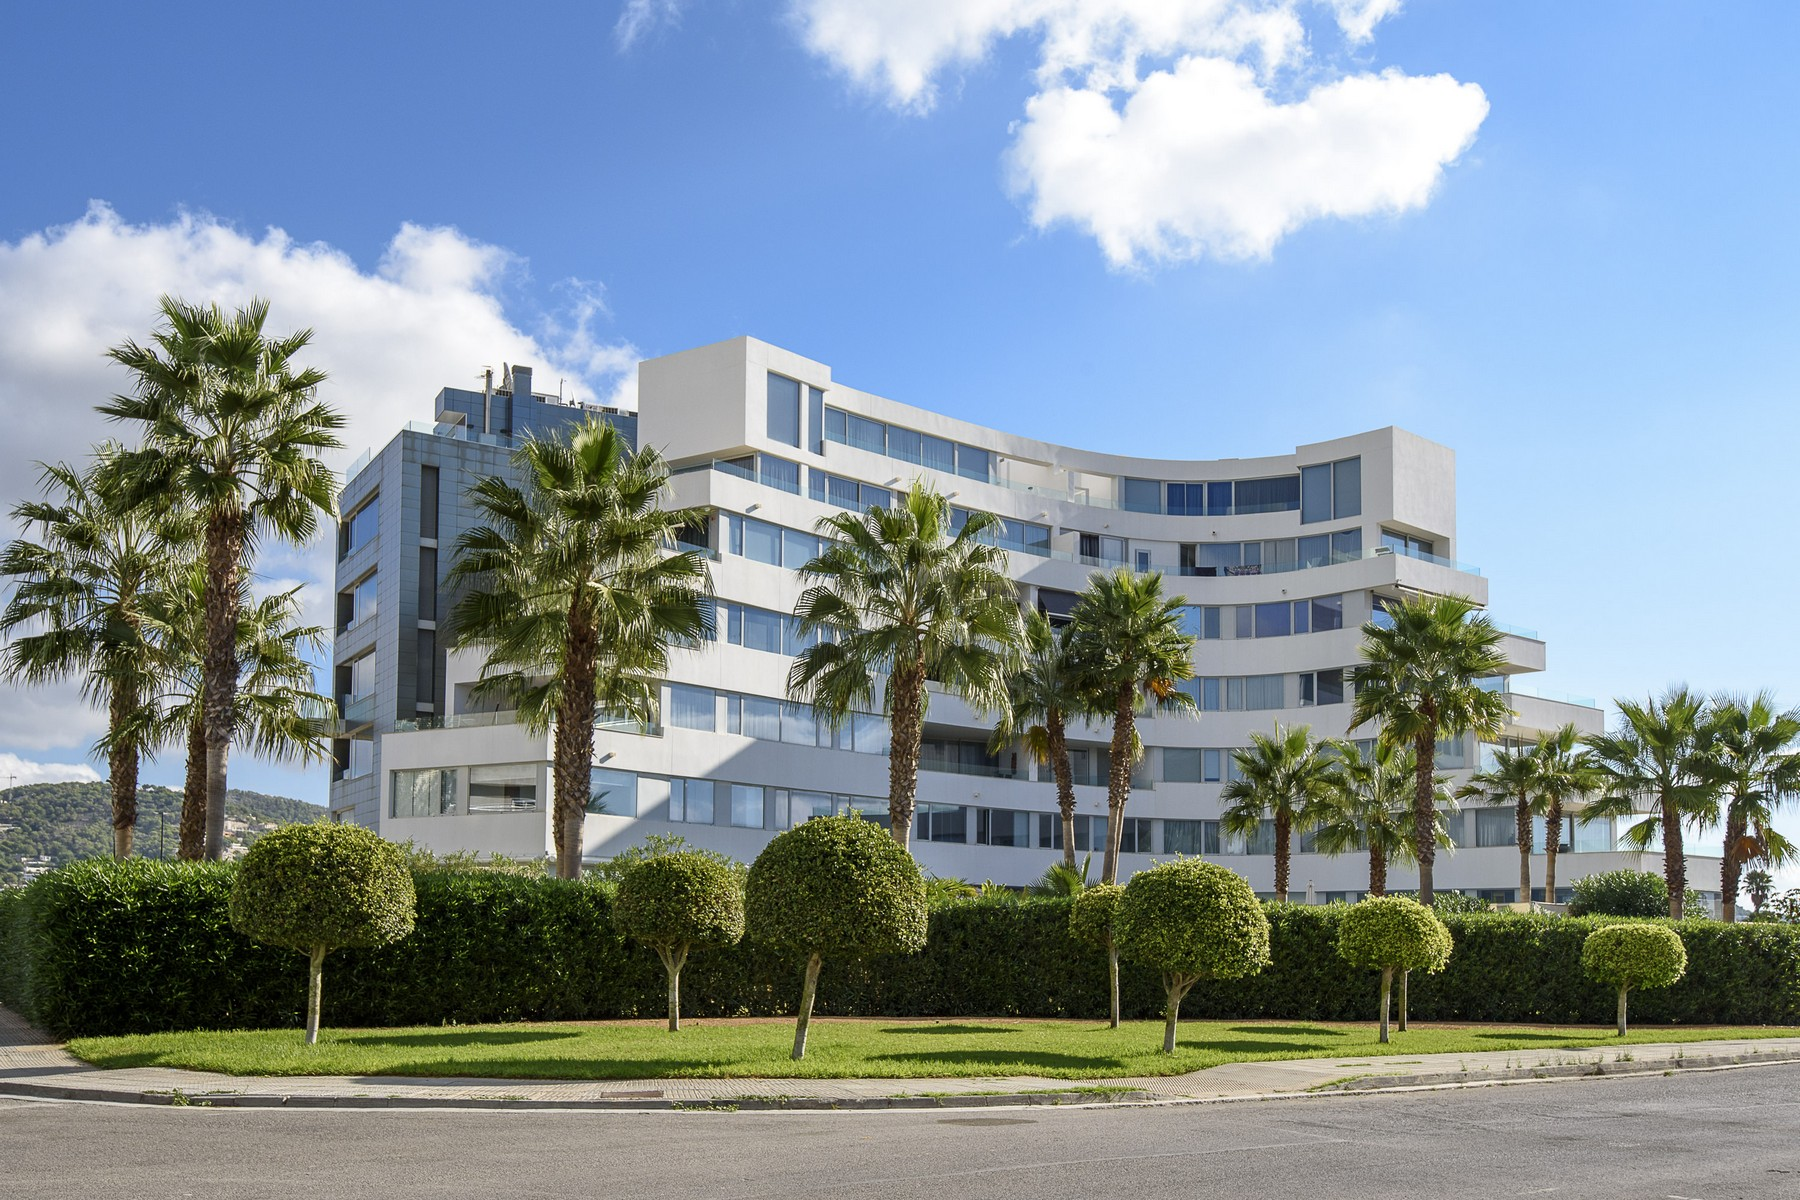 公寓 為 出售 在 Charming Apartment Near Talamanca And Botafoch Ibiza, 西亞特, 07800 西班牙